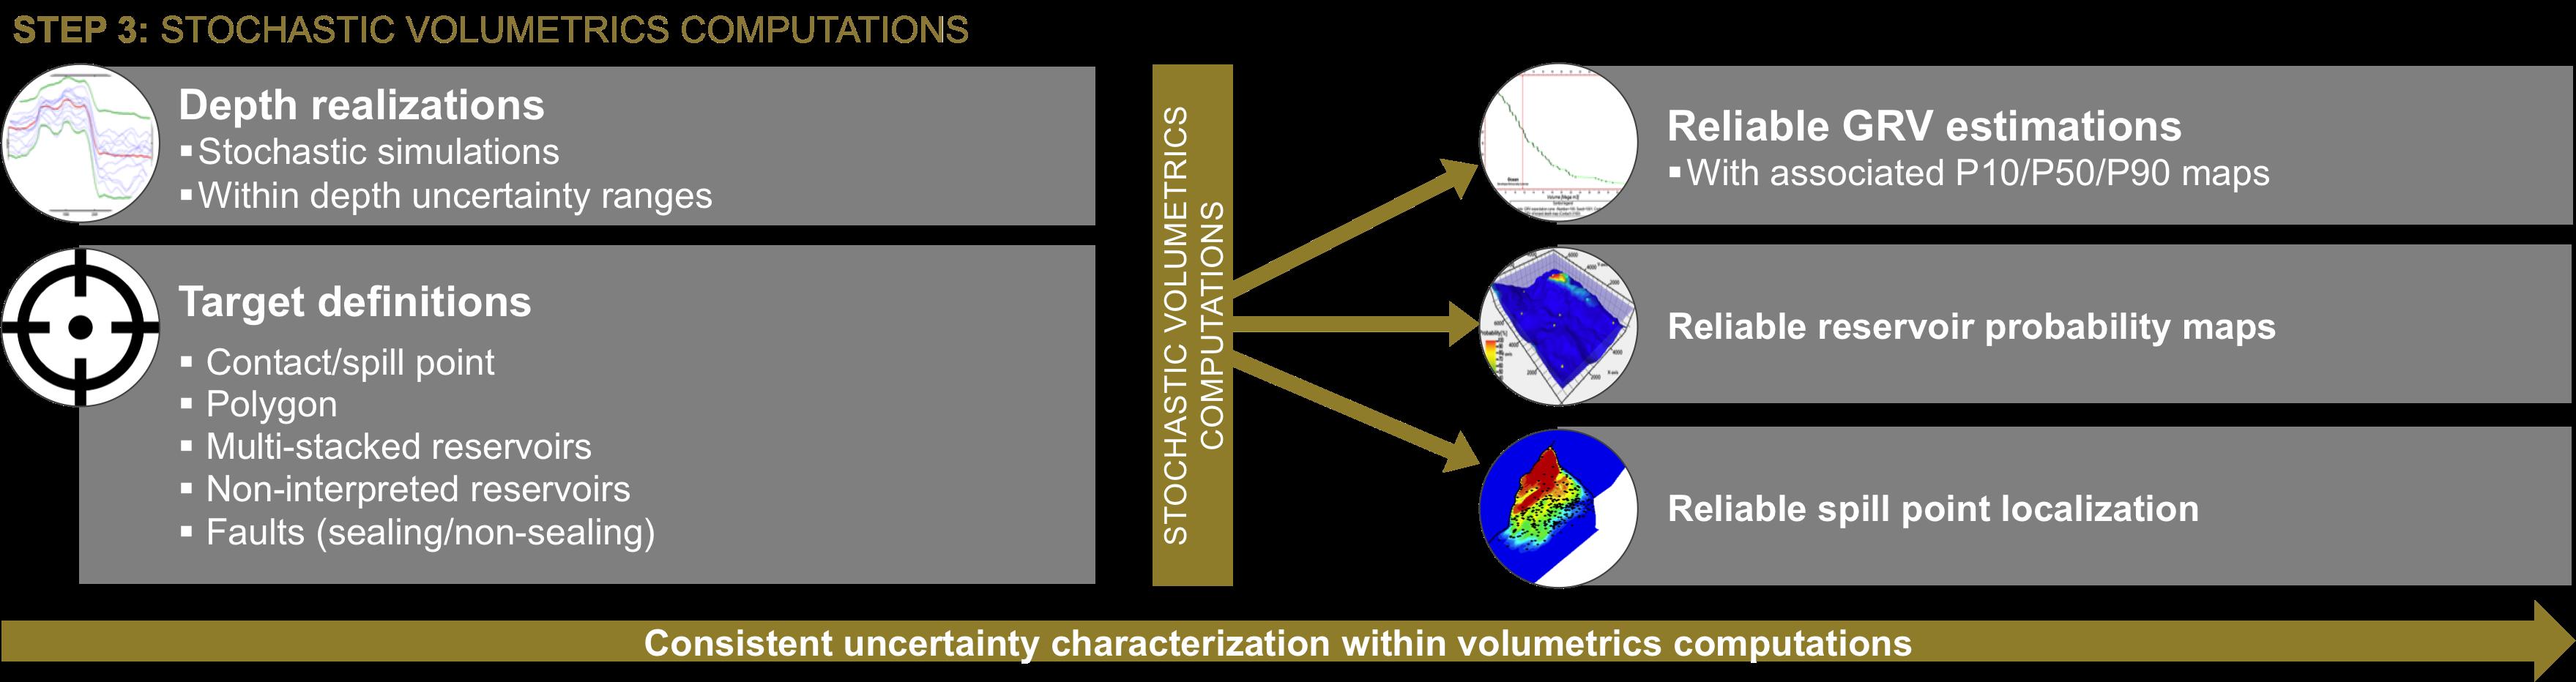 Step 3: Stochastic Volumetric Computations